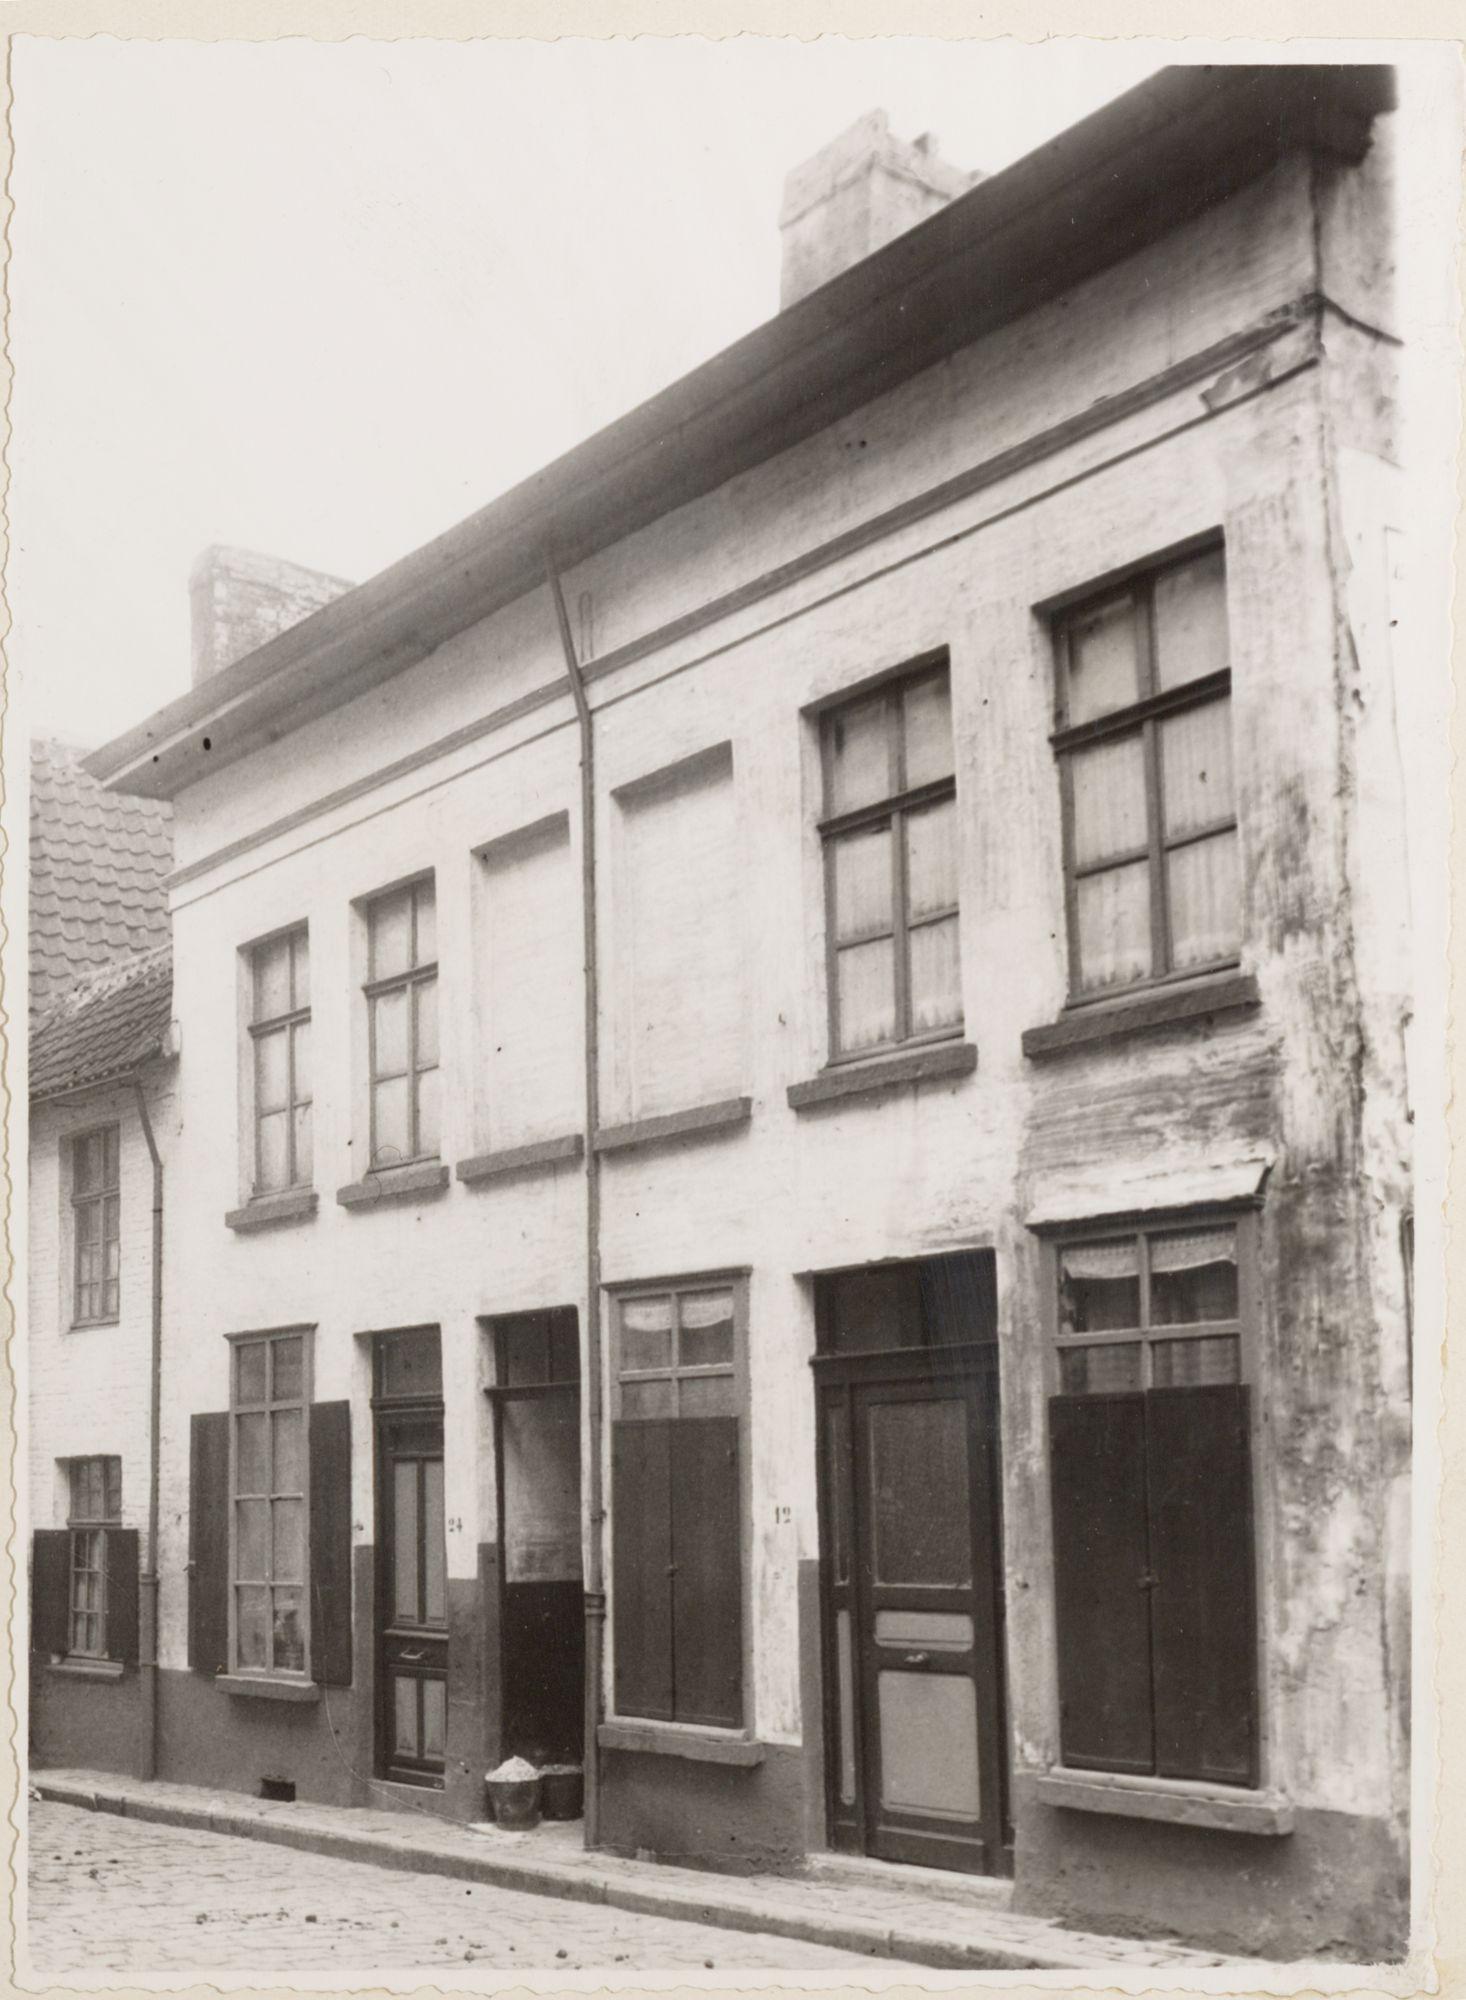 Gent: Veerstraat (nu Veermanplein), januari 1940